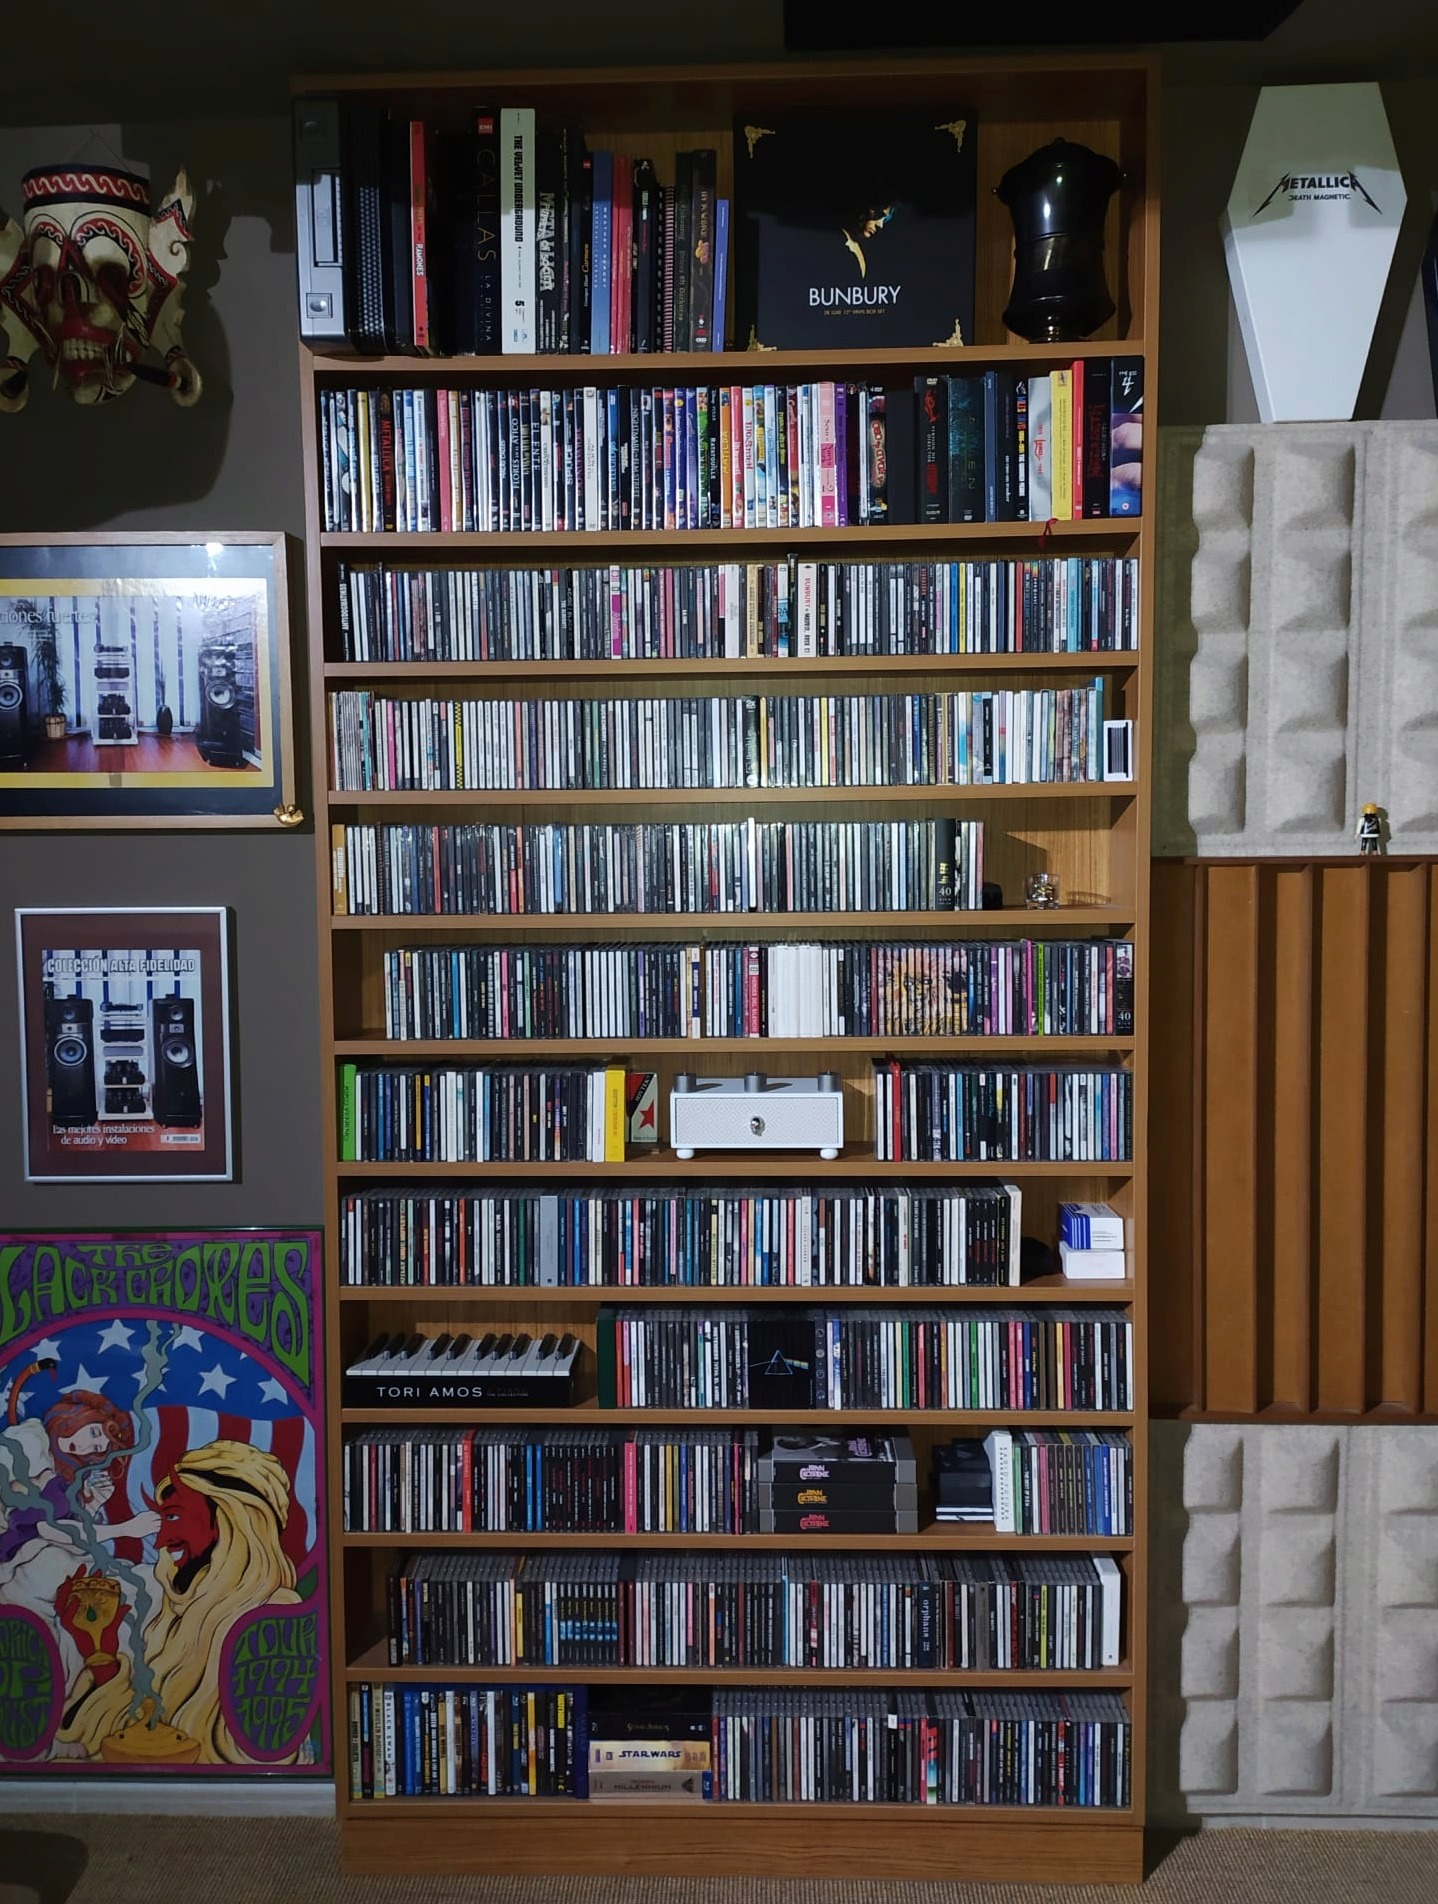 Salas audiofilas - Página 2 Img_2045